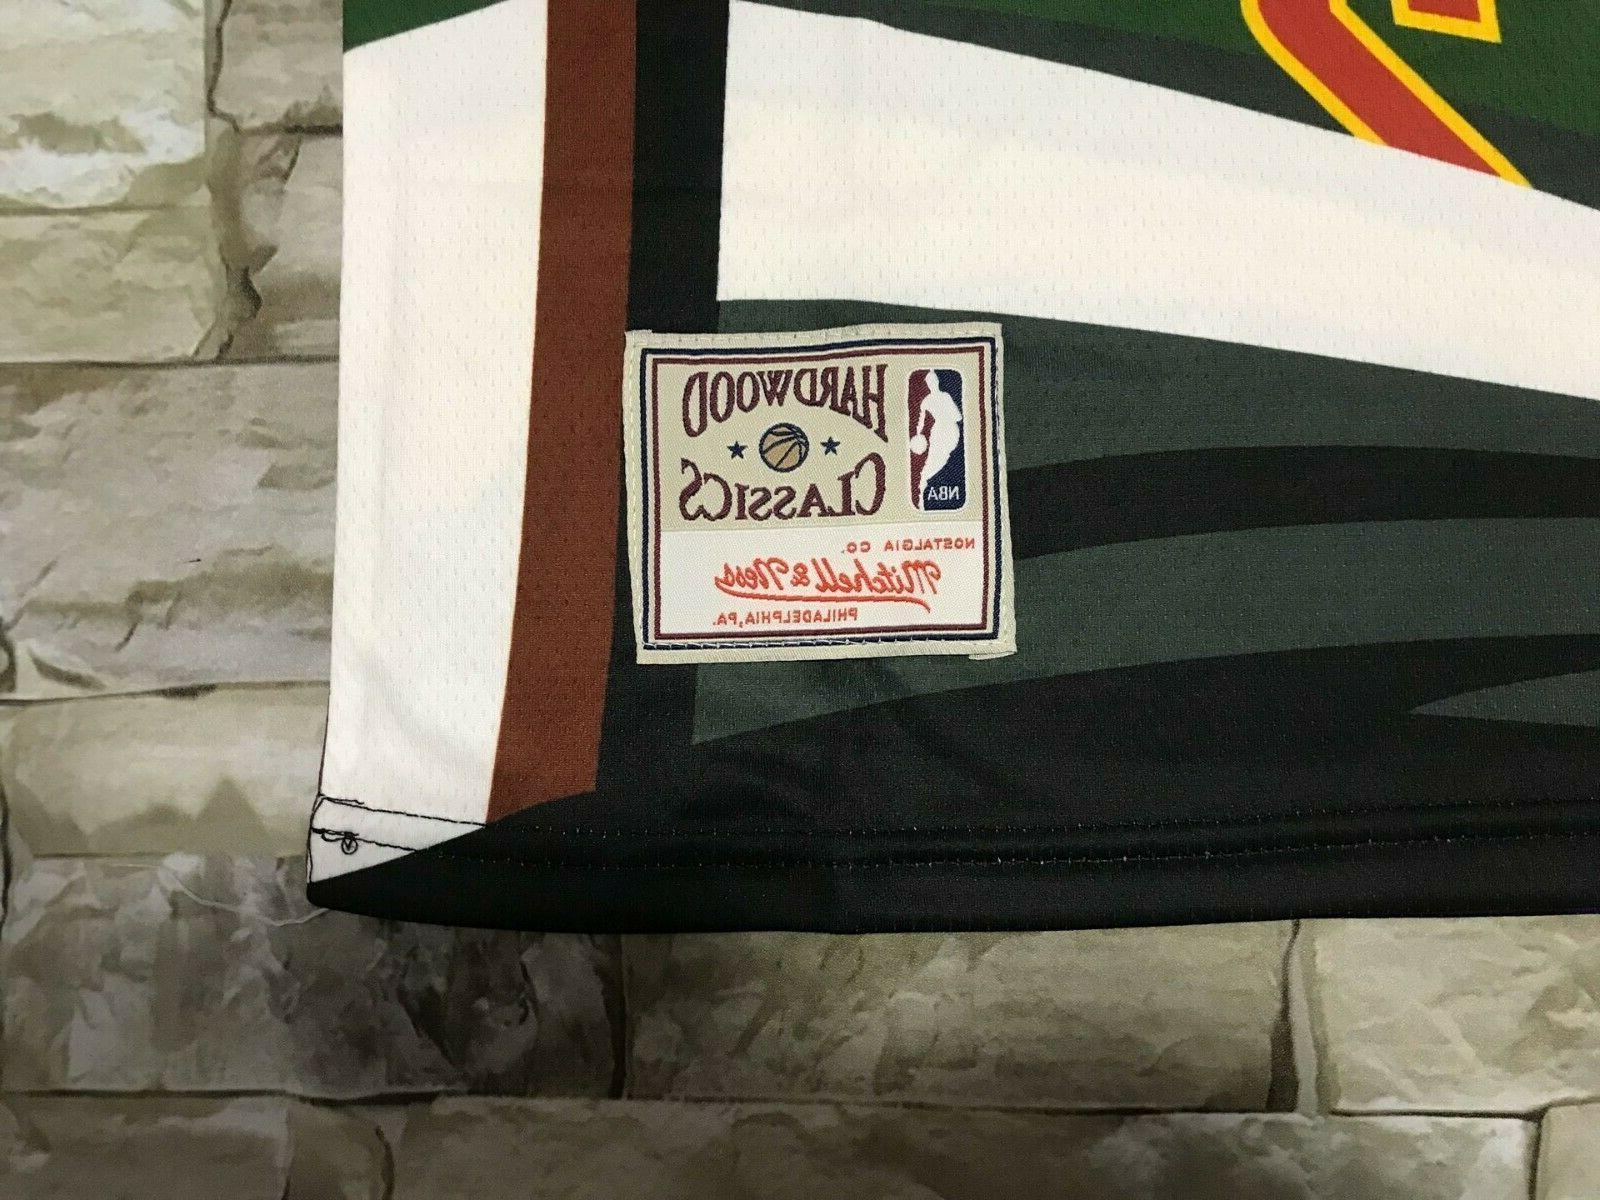 Mens #11 Irving jersey